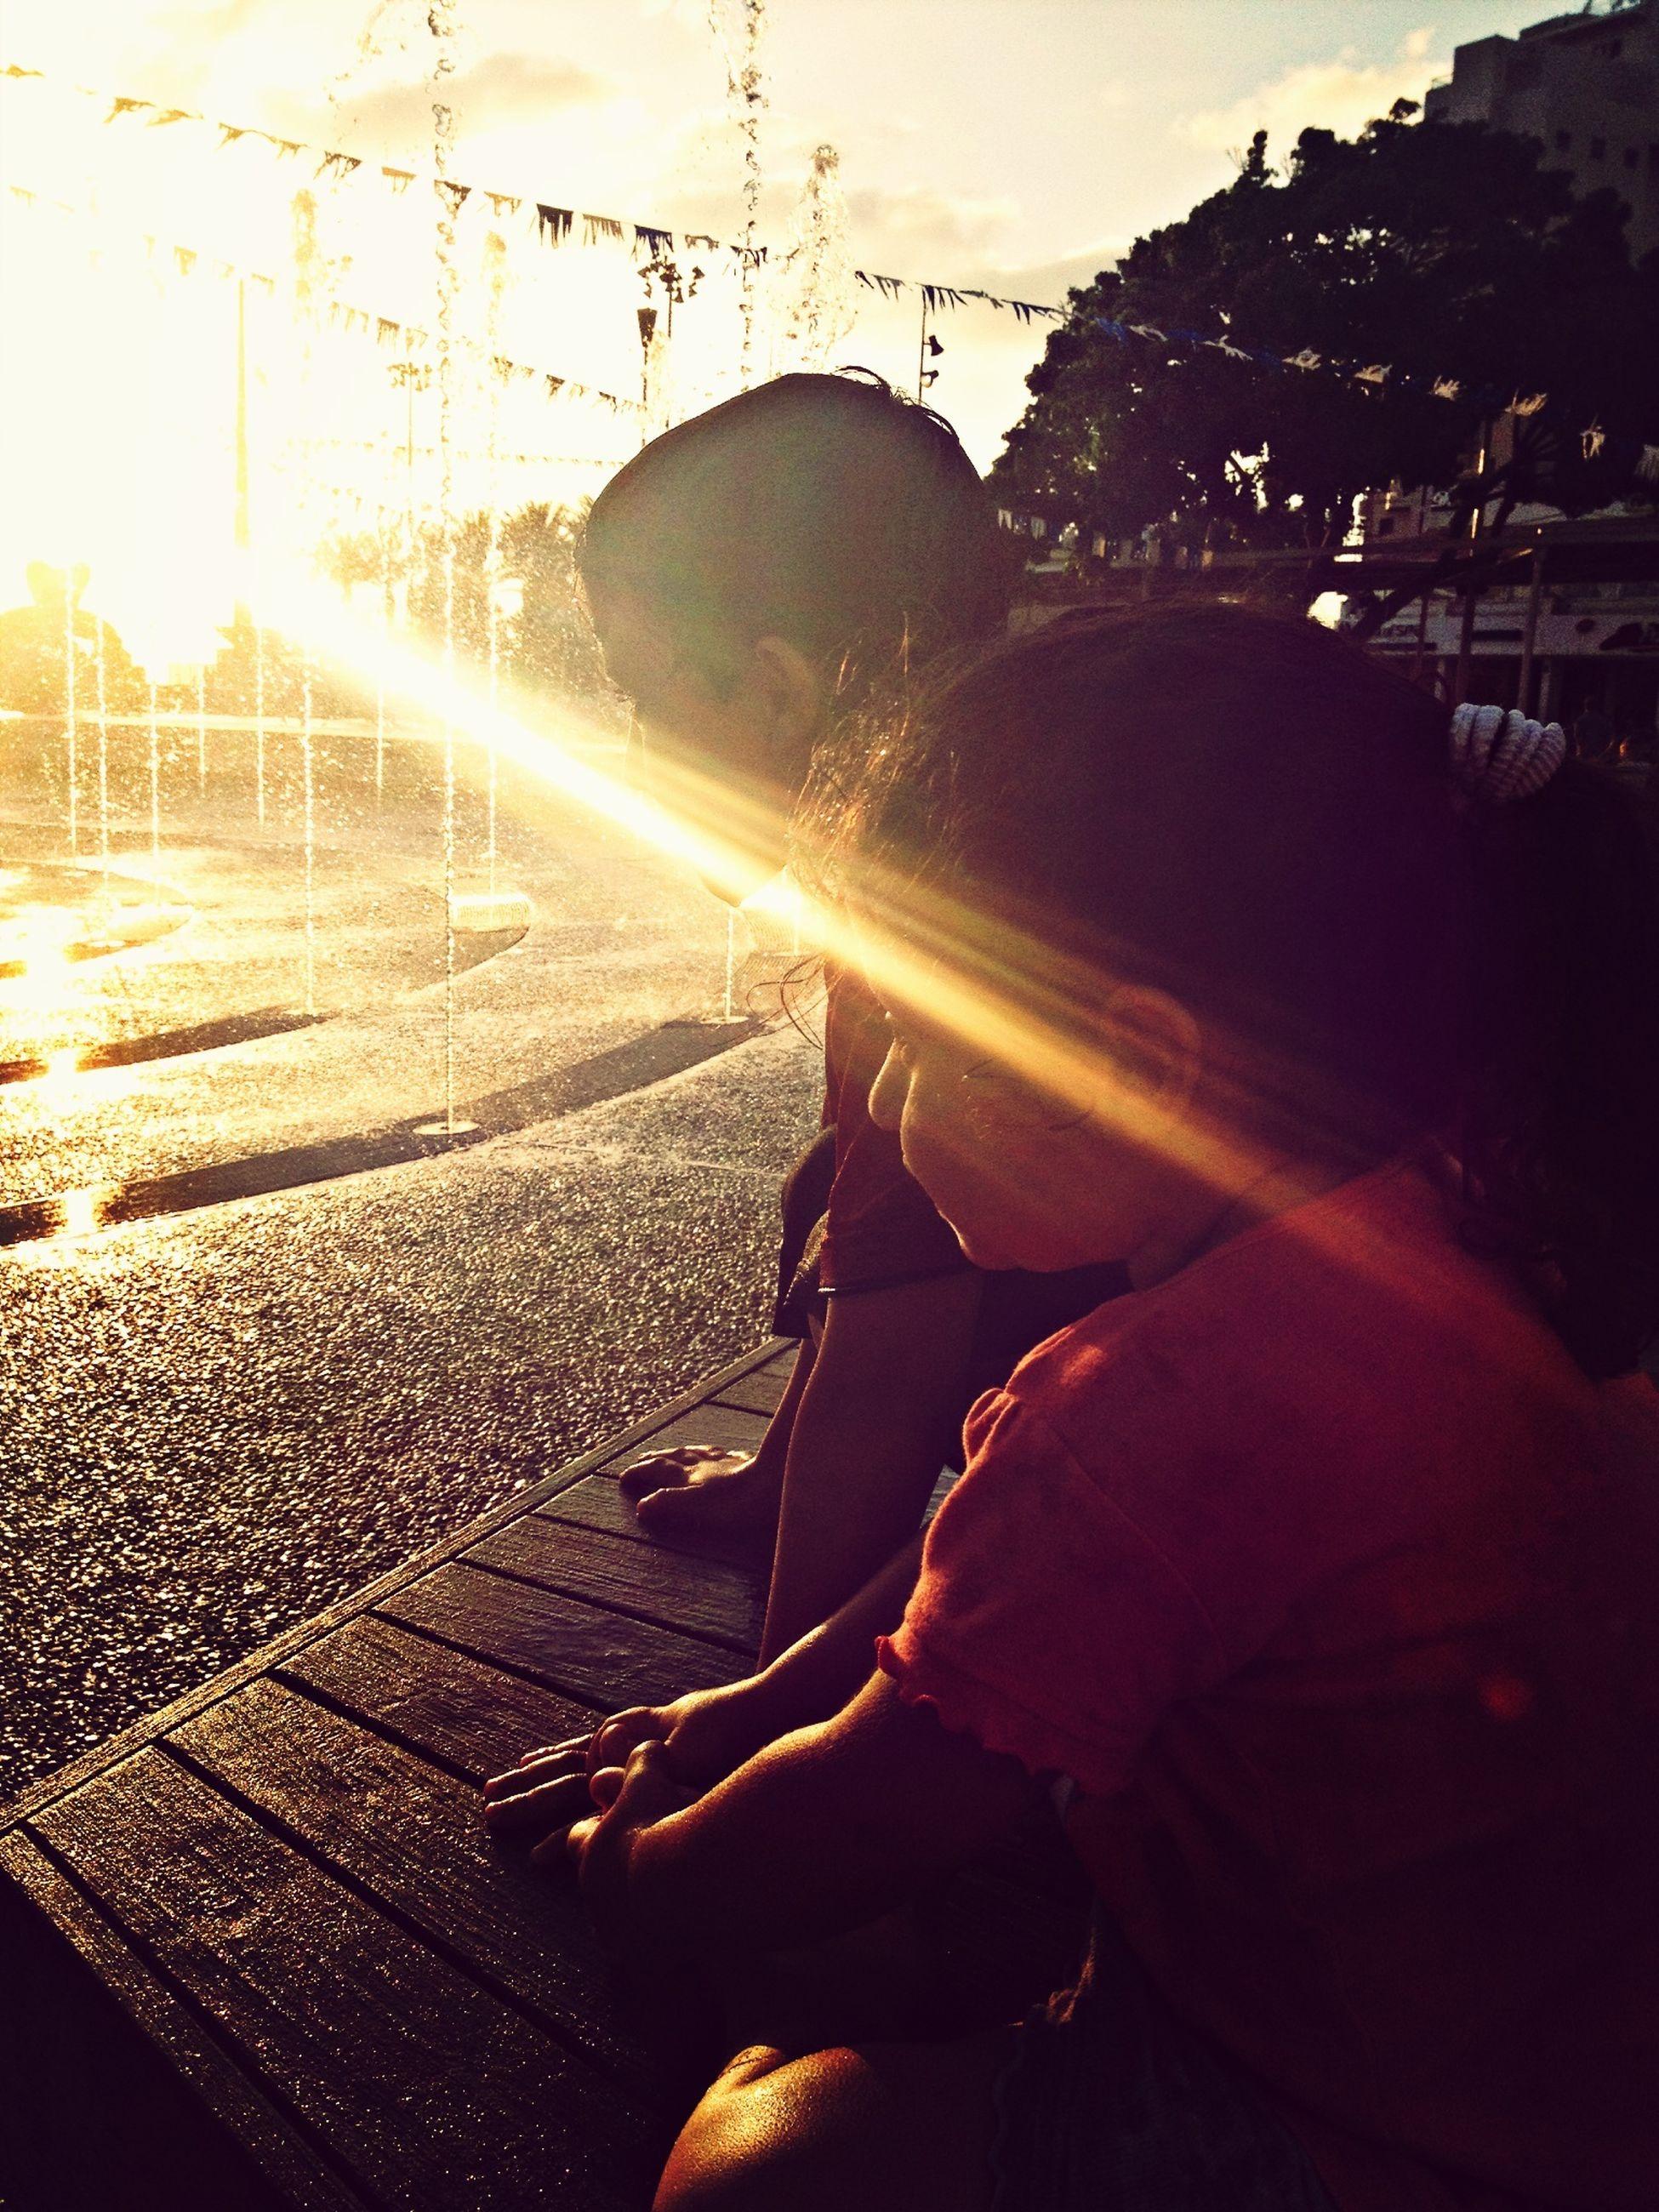 lifestyles, men, sunbeam, leisure activity, sunlight, transportation, sun, lens flare, mode of transport, sunset, land vehicle, car, rear view, silhouette, street, person, travel